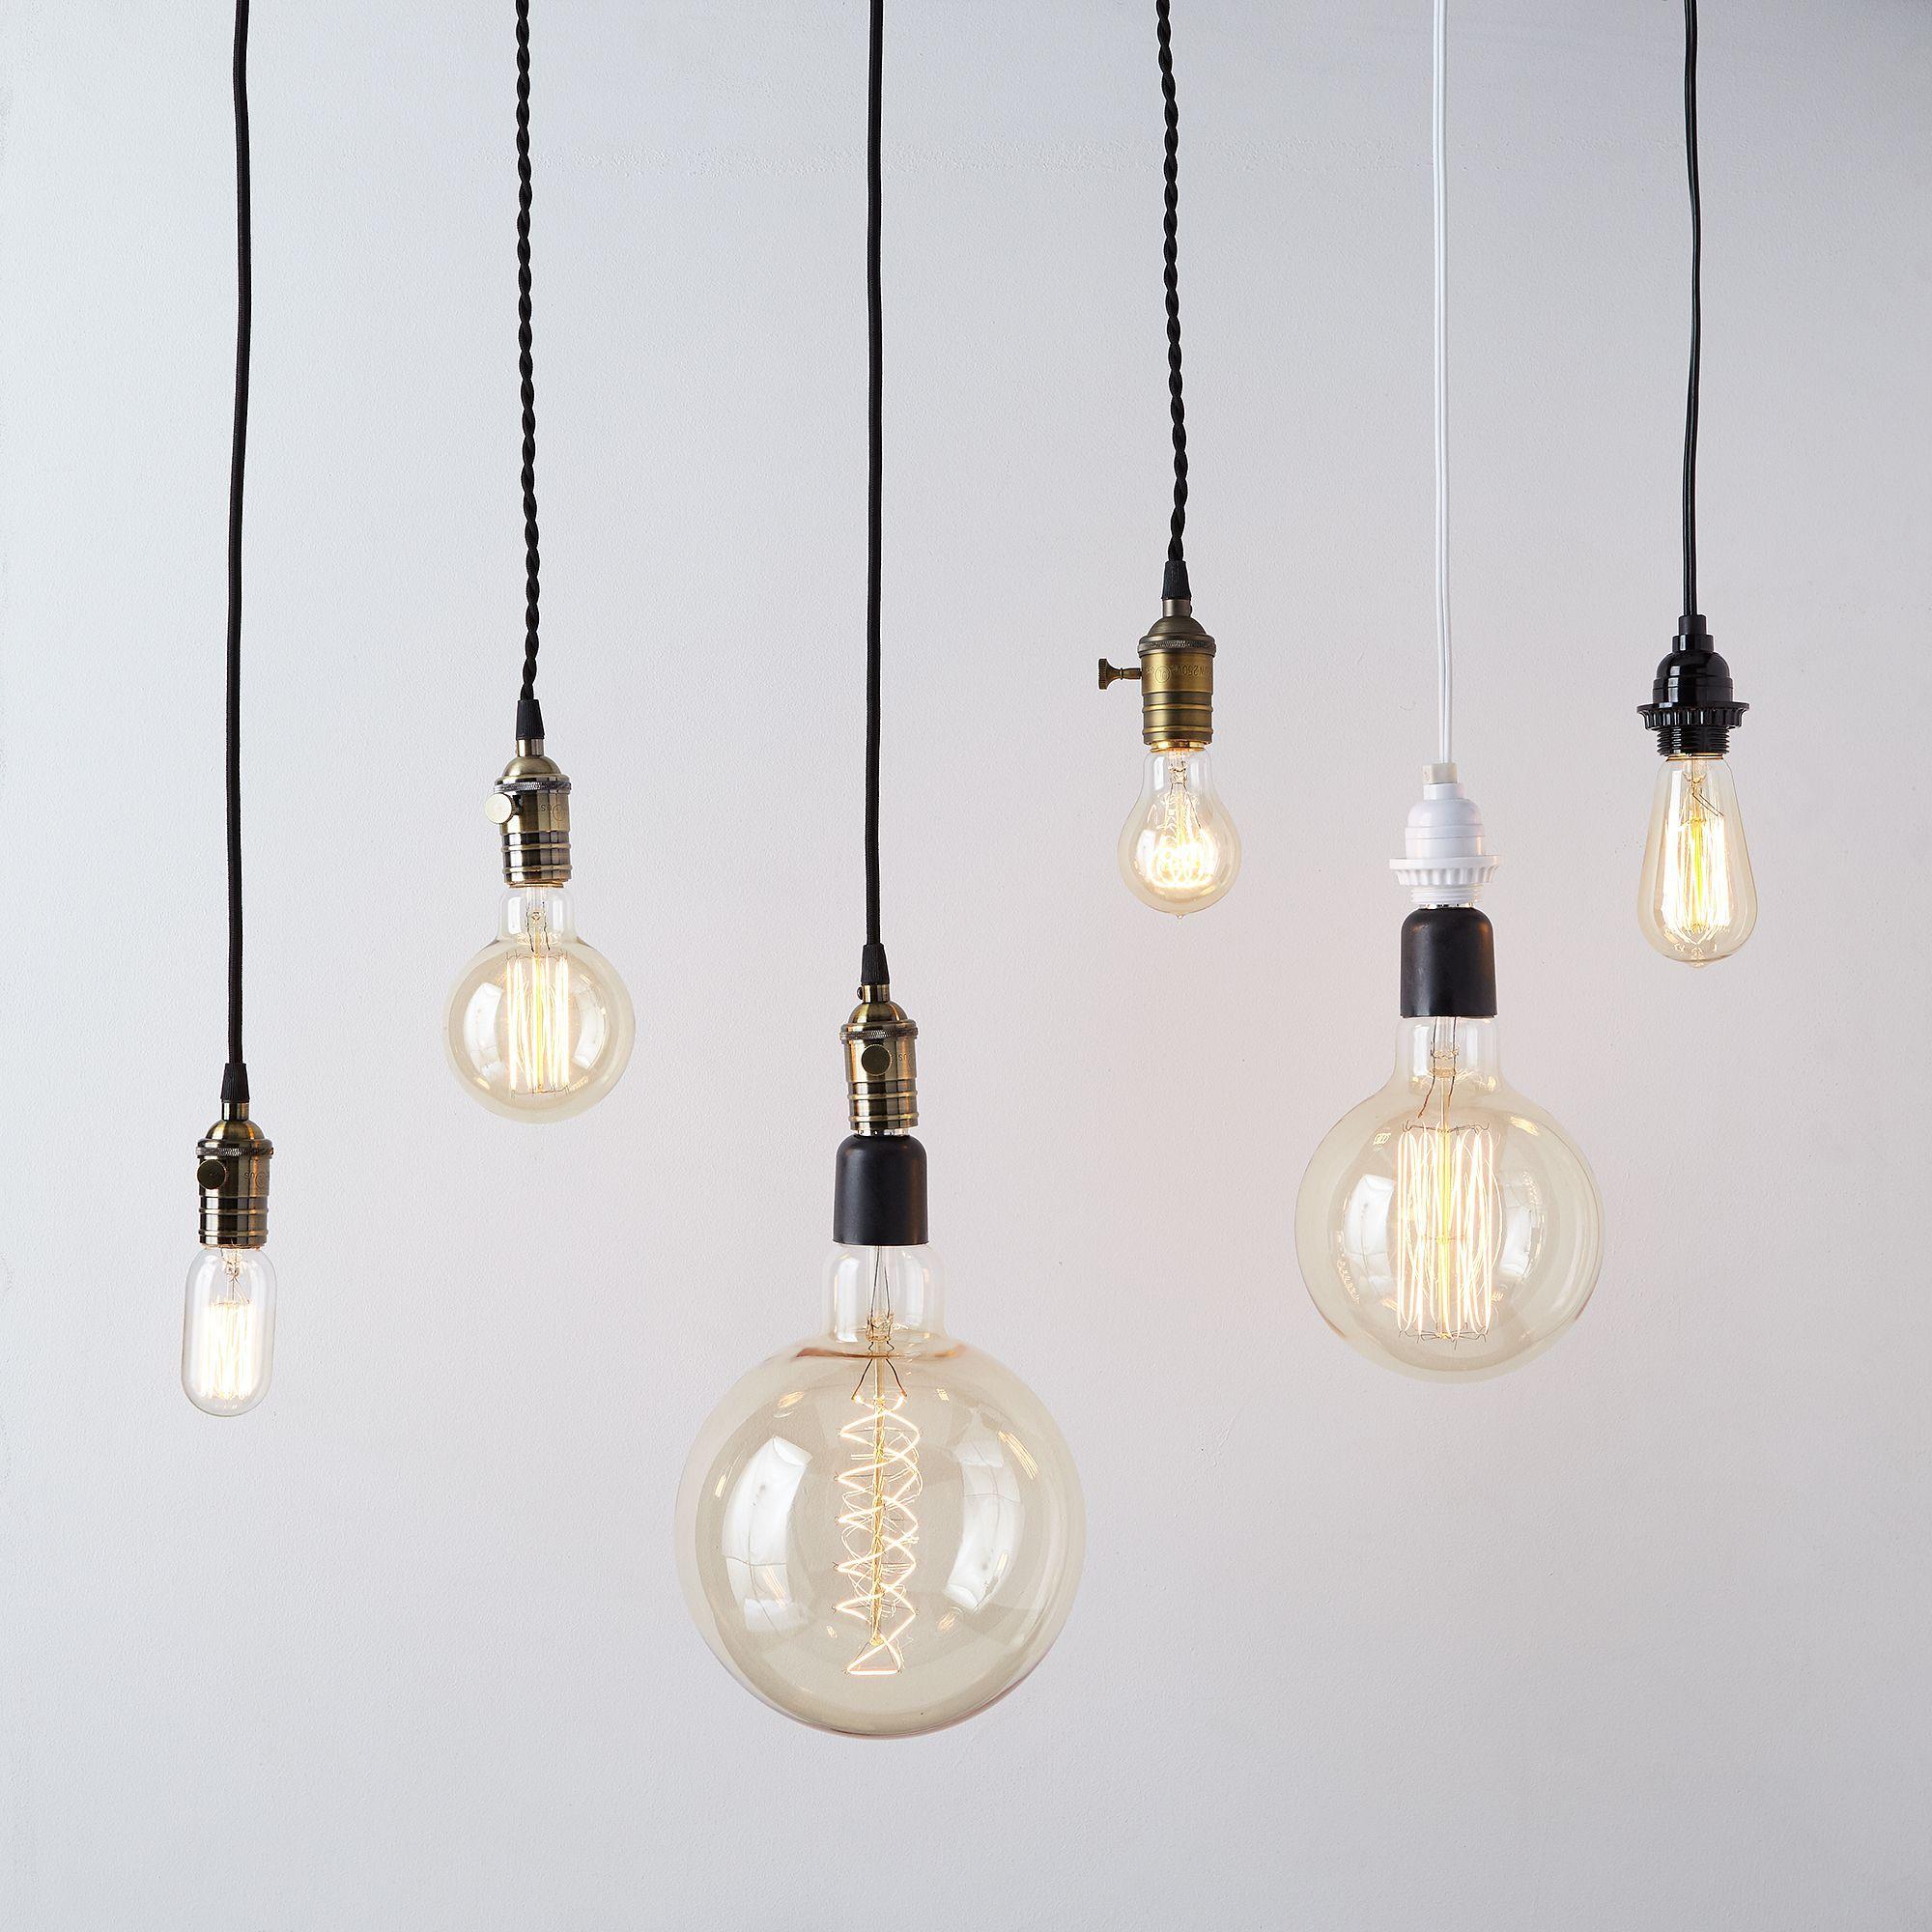 Pendant Filament Bulbs On Food52 Filament Bulb Light Bulb Bulb